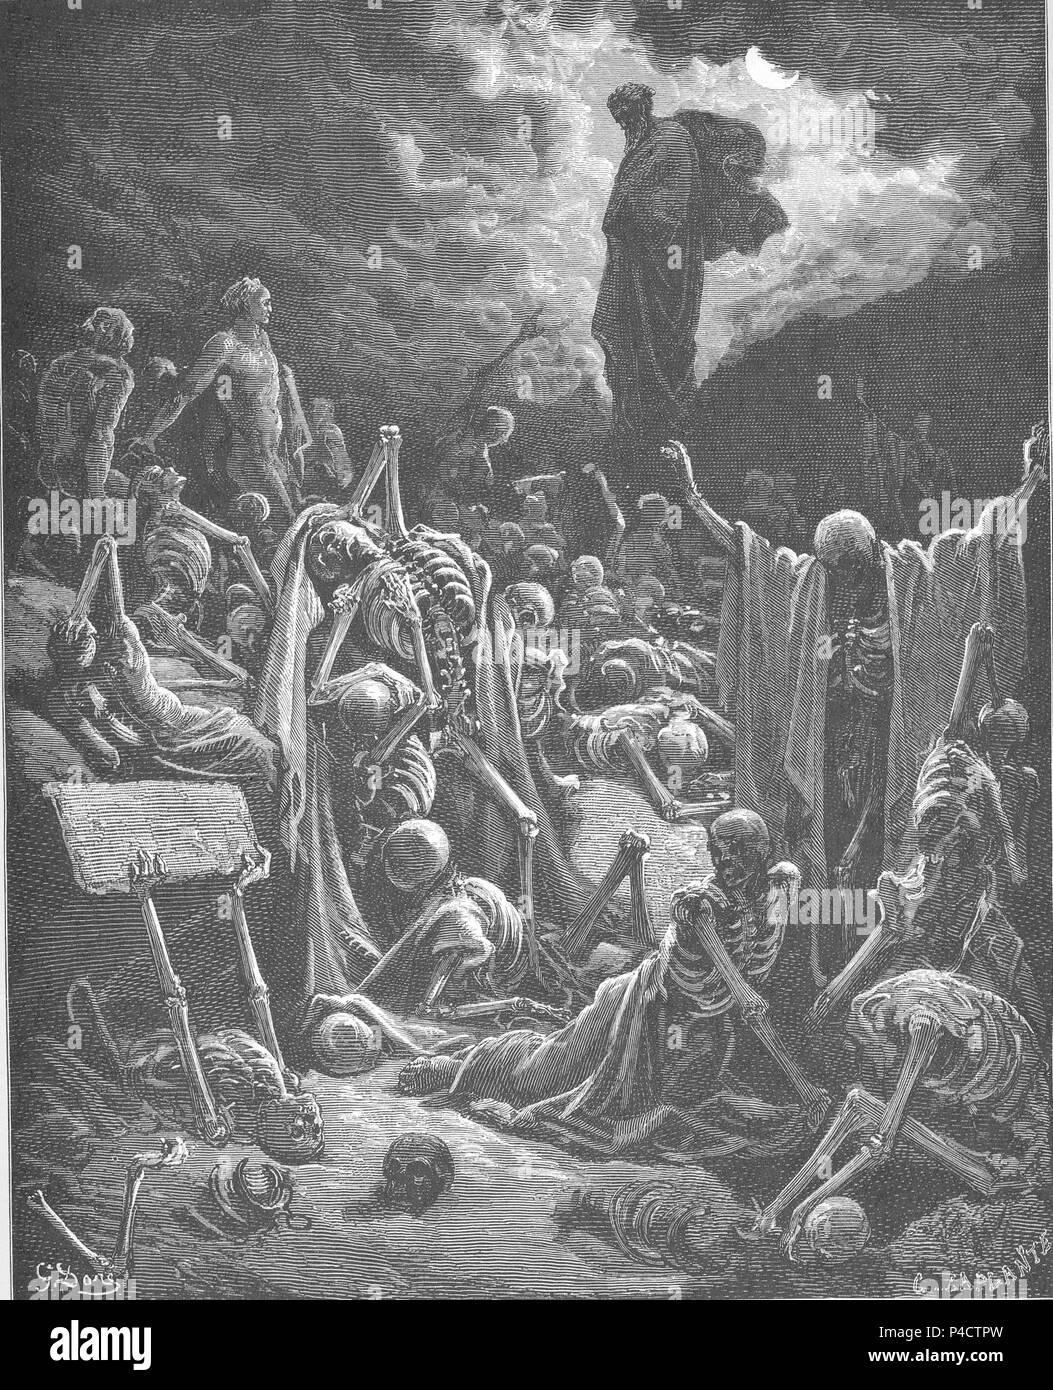 127.EzekielE28099s Vision of the Valley of Dry Bones. - Stock Image